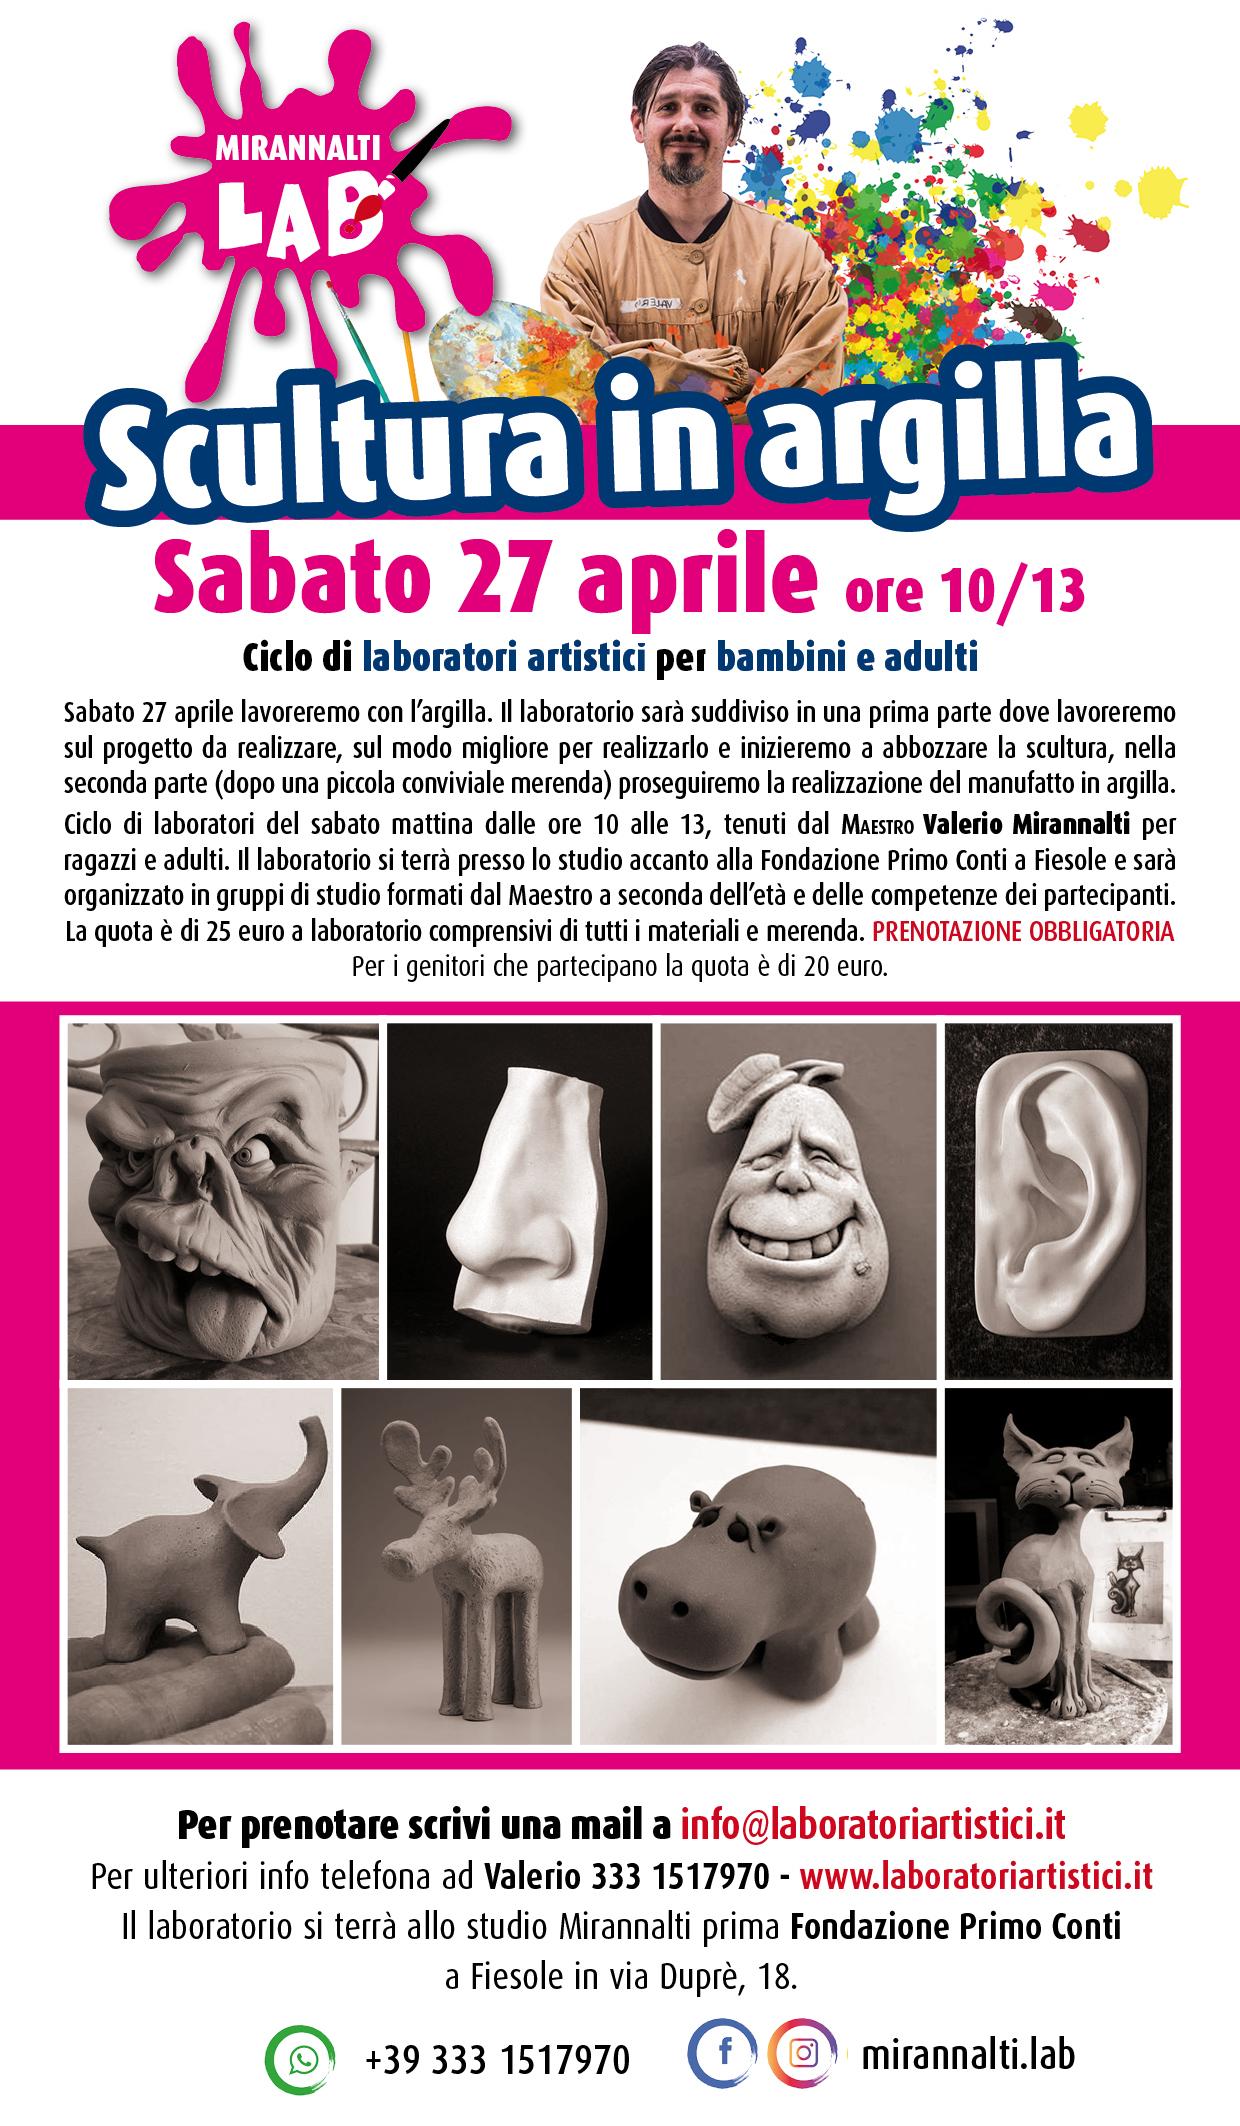 Sabato 27 aprile – Scultura in argilla